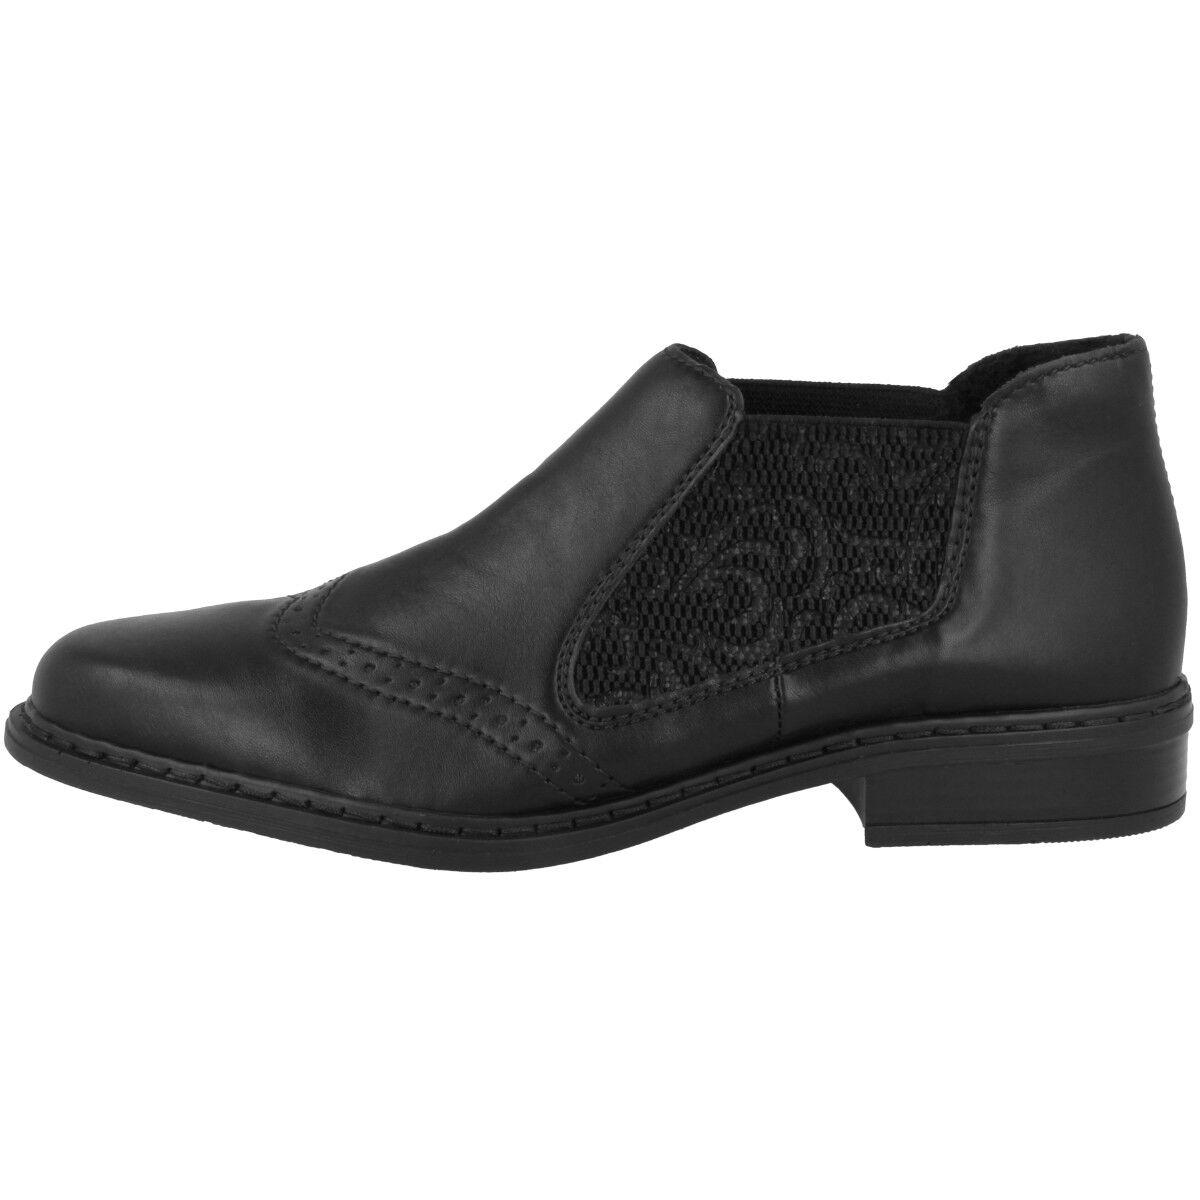 Rieker Florenz-Embossweaving Chaussures Anti-stress Bottines Chelsea Bottes